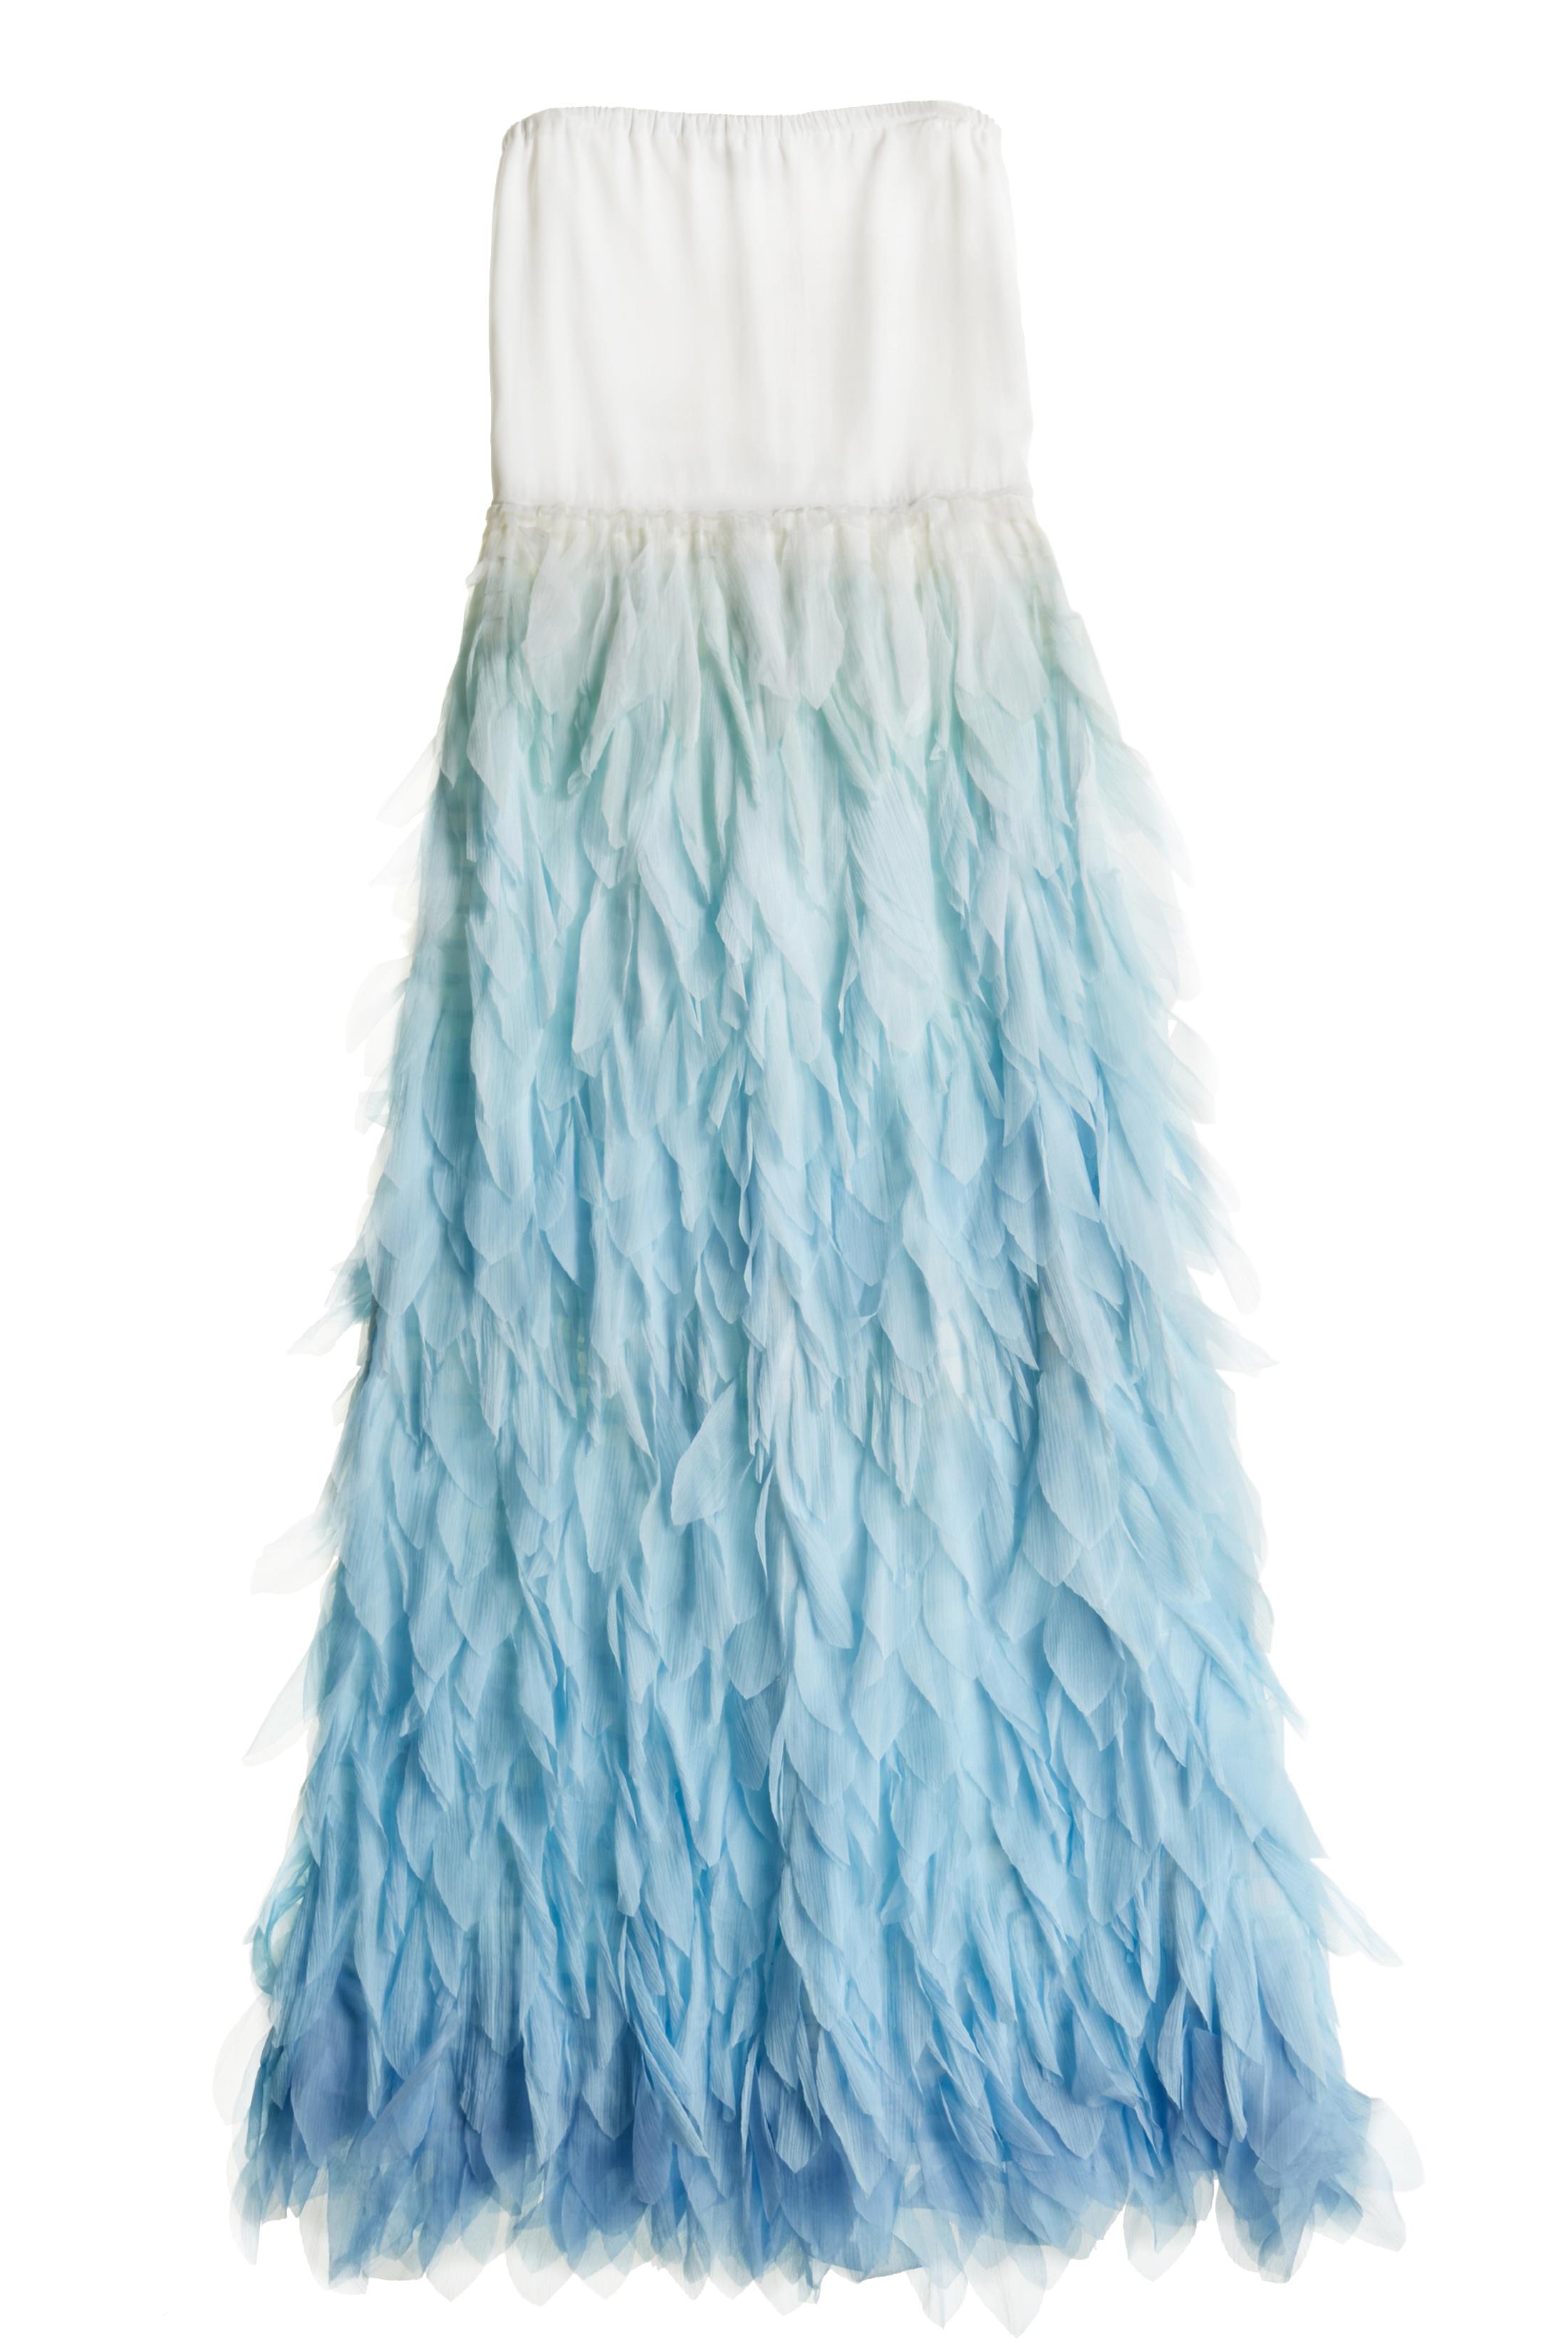 calypso-st-barth-bridal-janli-dress-0315.jpg